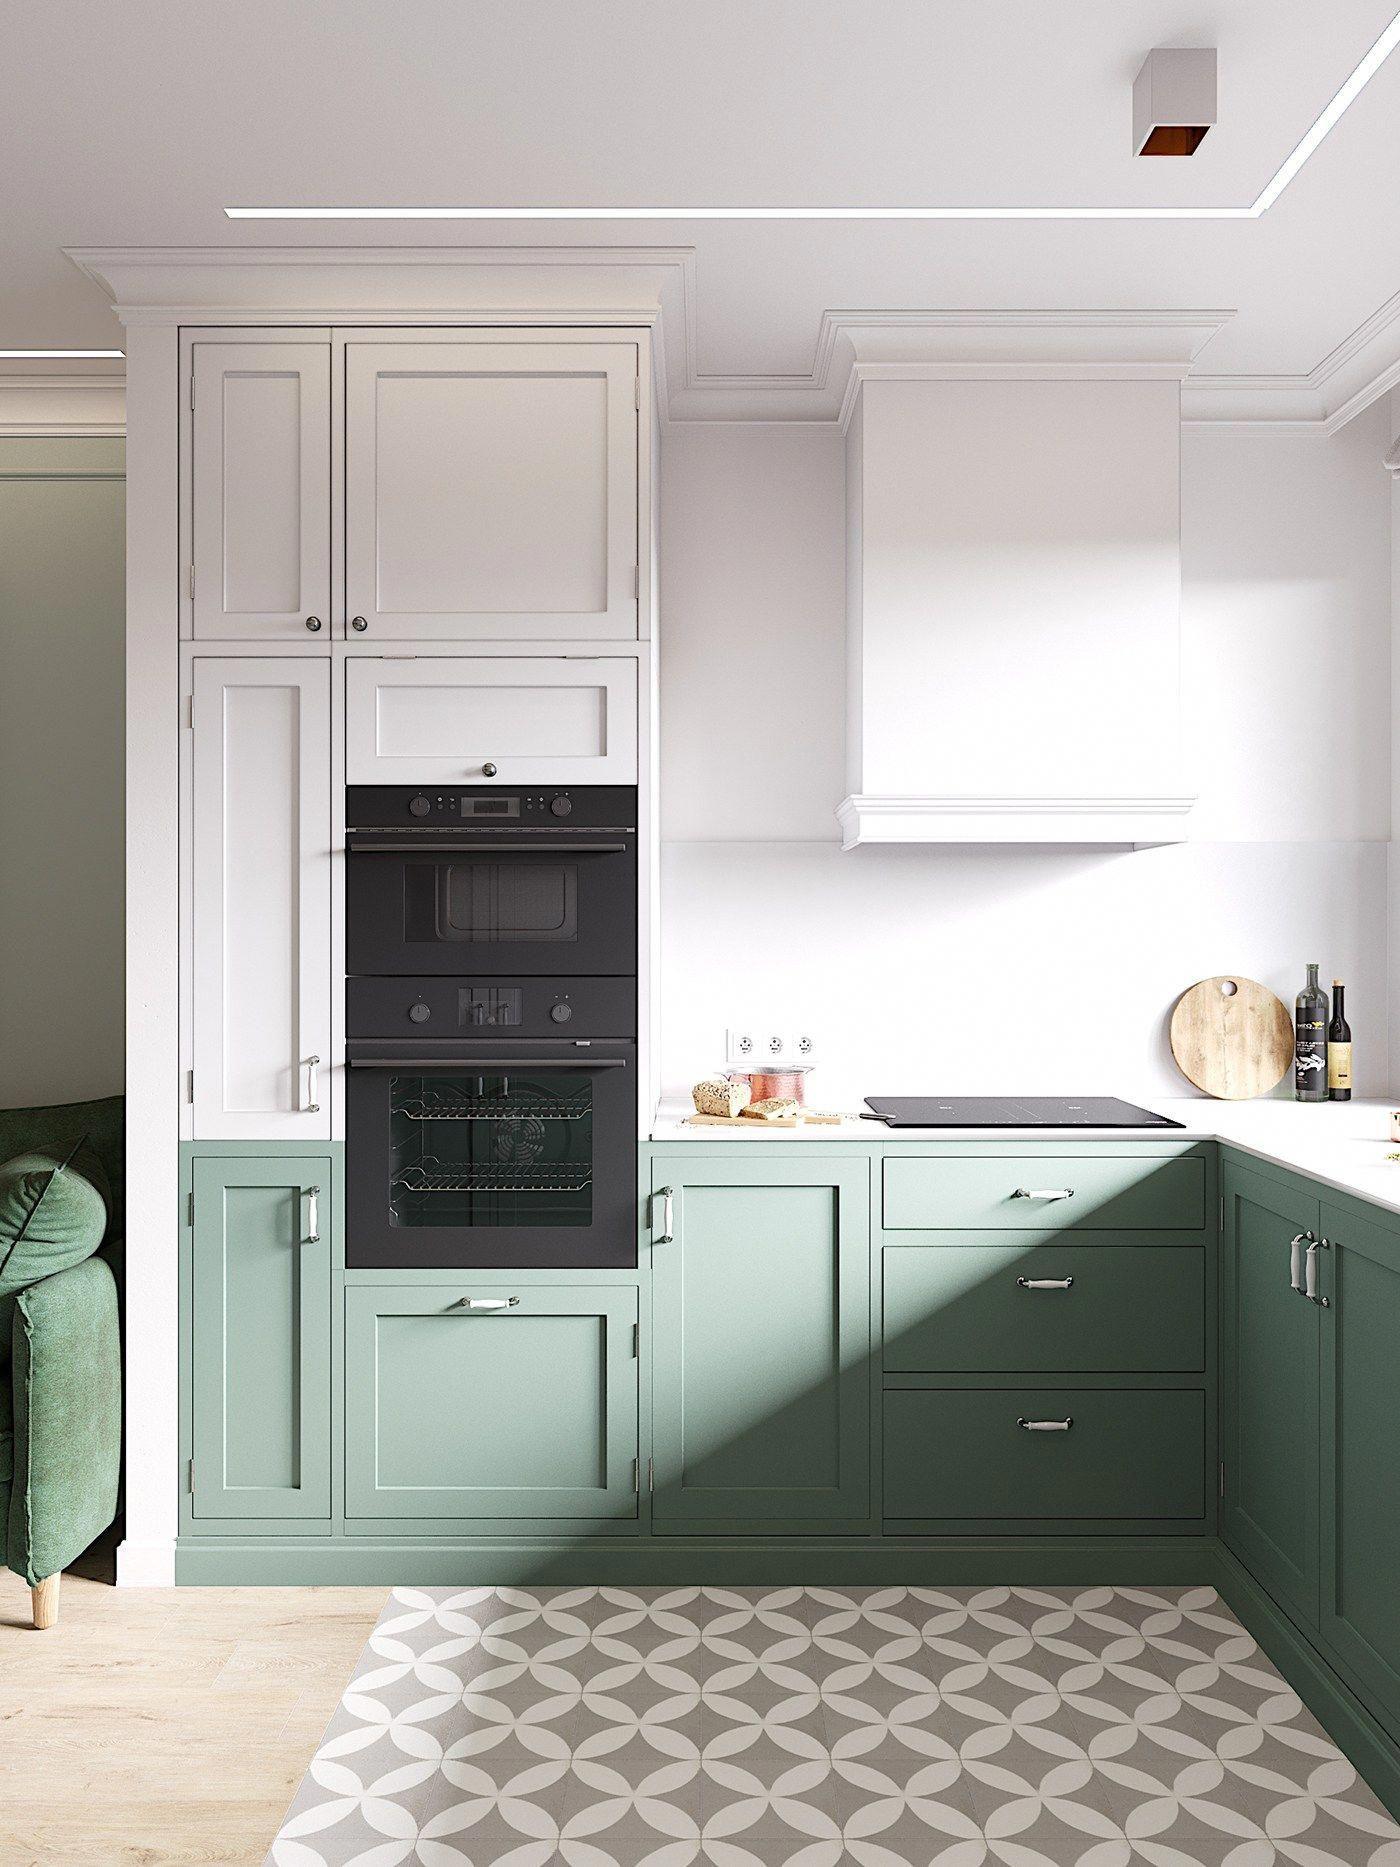 Small Kitchen Interior Design Ideas In Indian Apartments Kitcheninteriordesign Used Kitchen Cabinets Kitchen Design Interior Design Kitchen